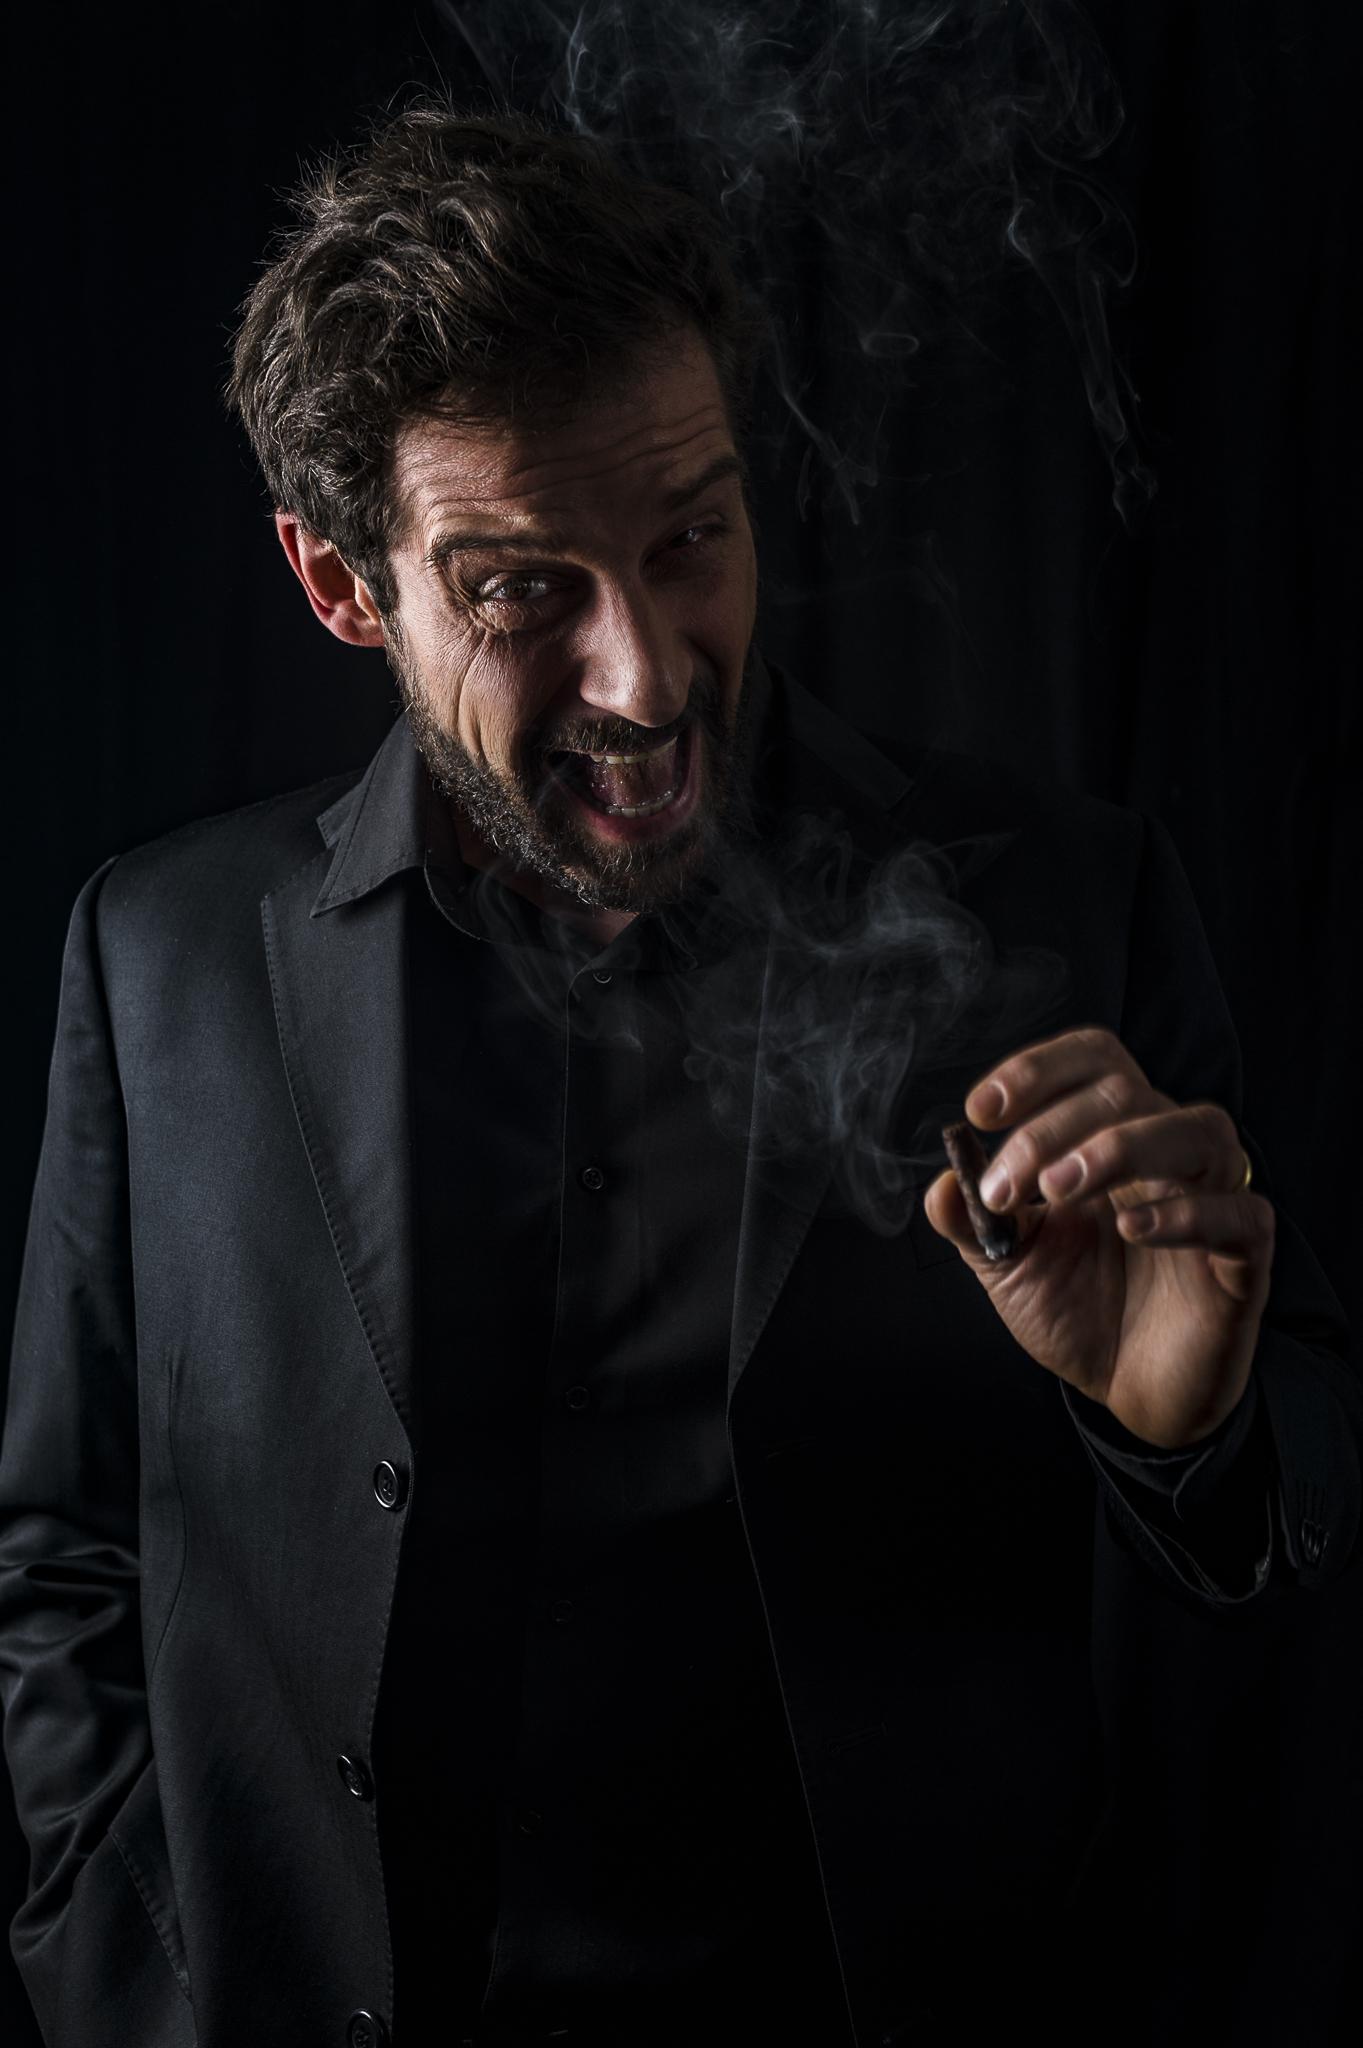 Maurizio Tesei - Daniele Butera Photography